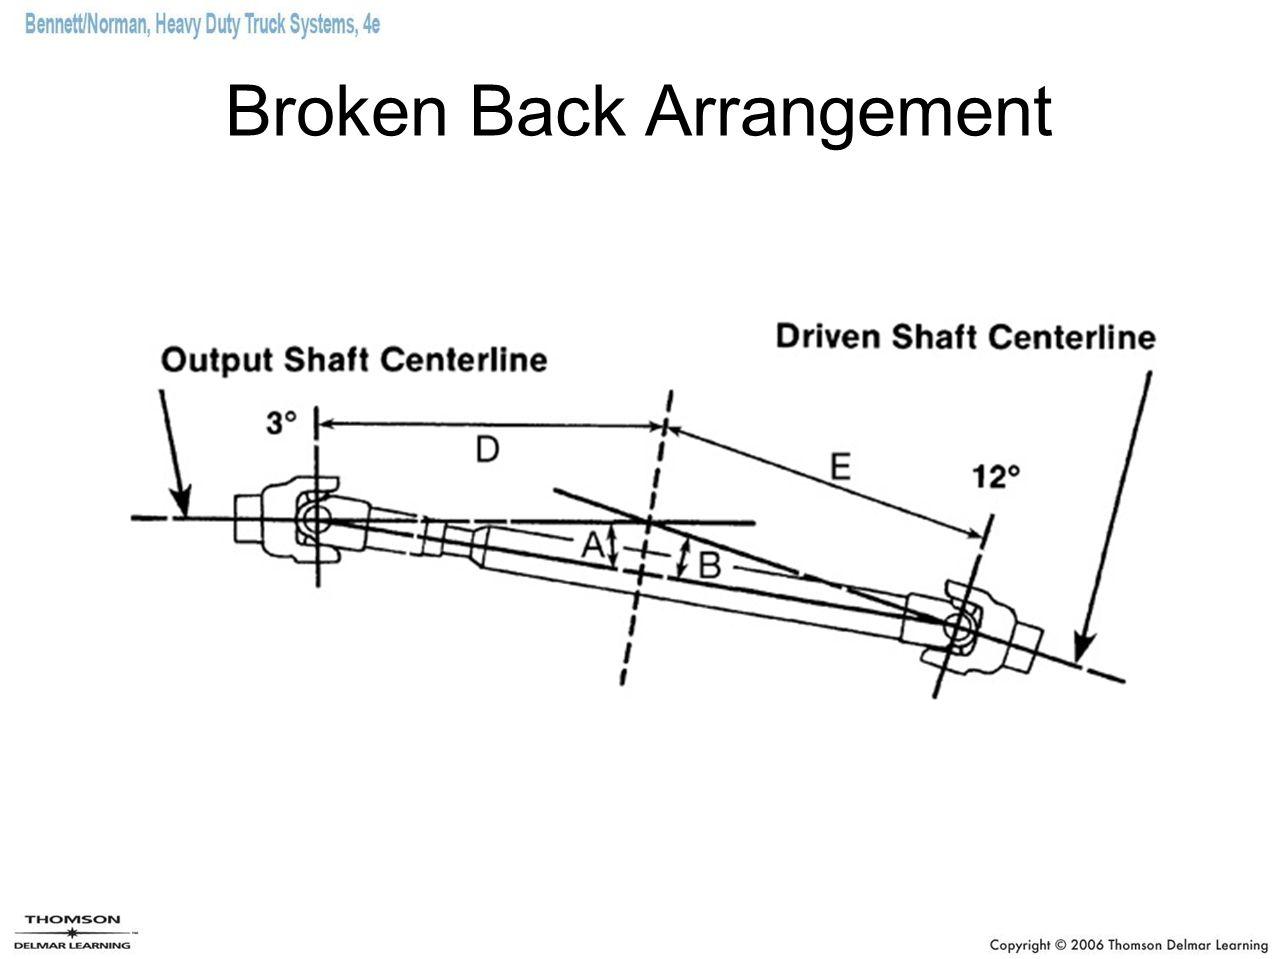 hight resolution of 13 broken back arrangement